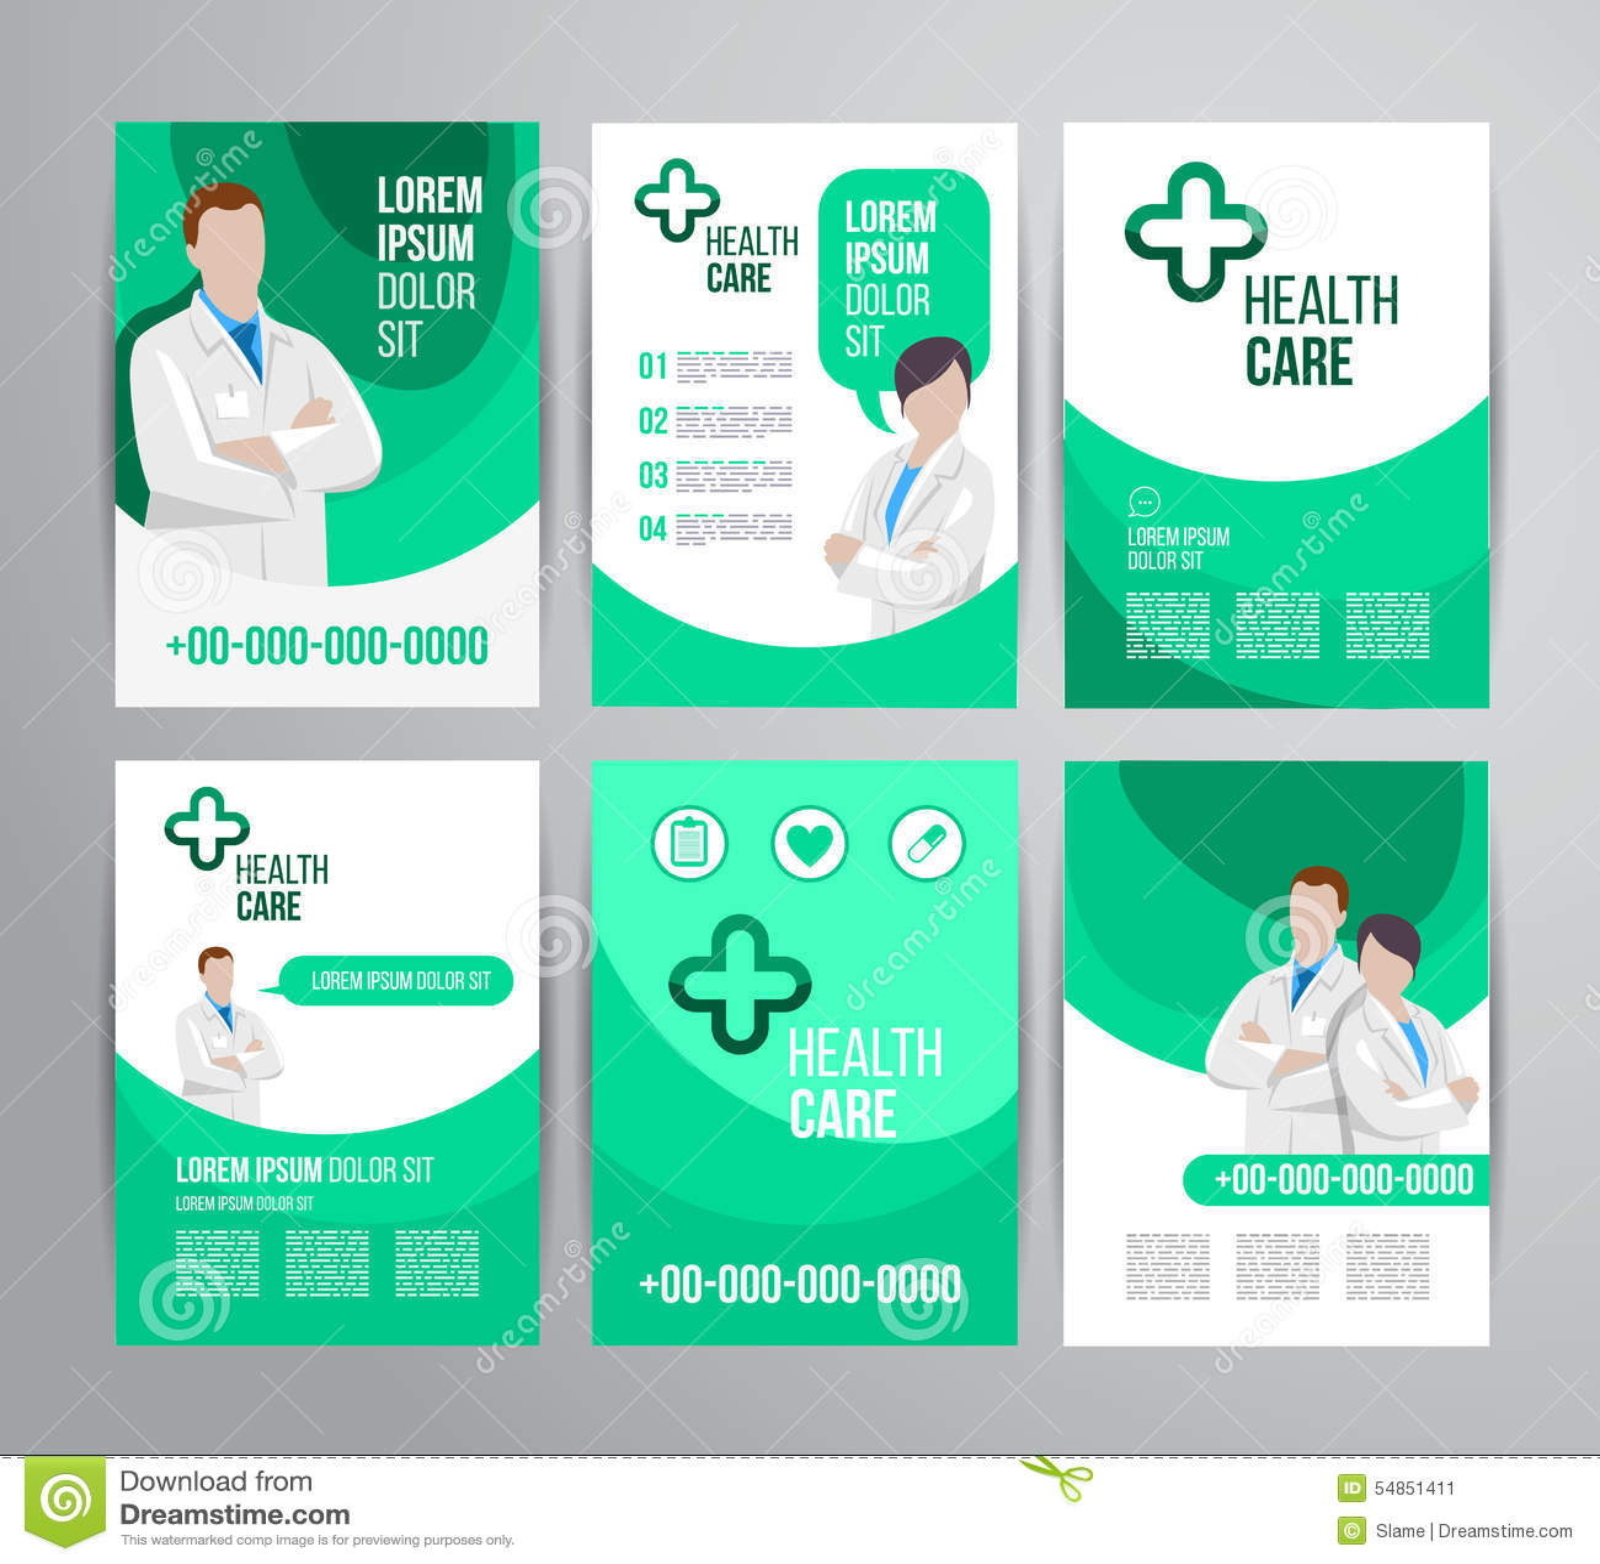 Healthcare Brochure. Hospital, Care.